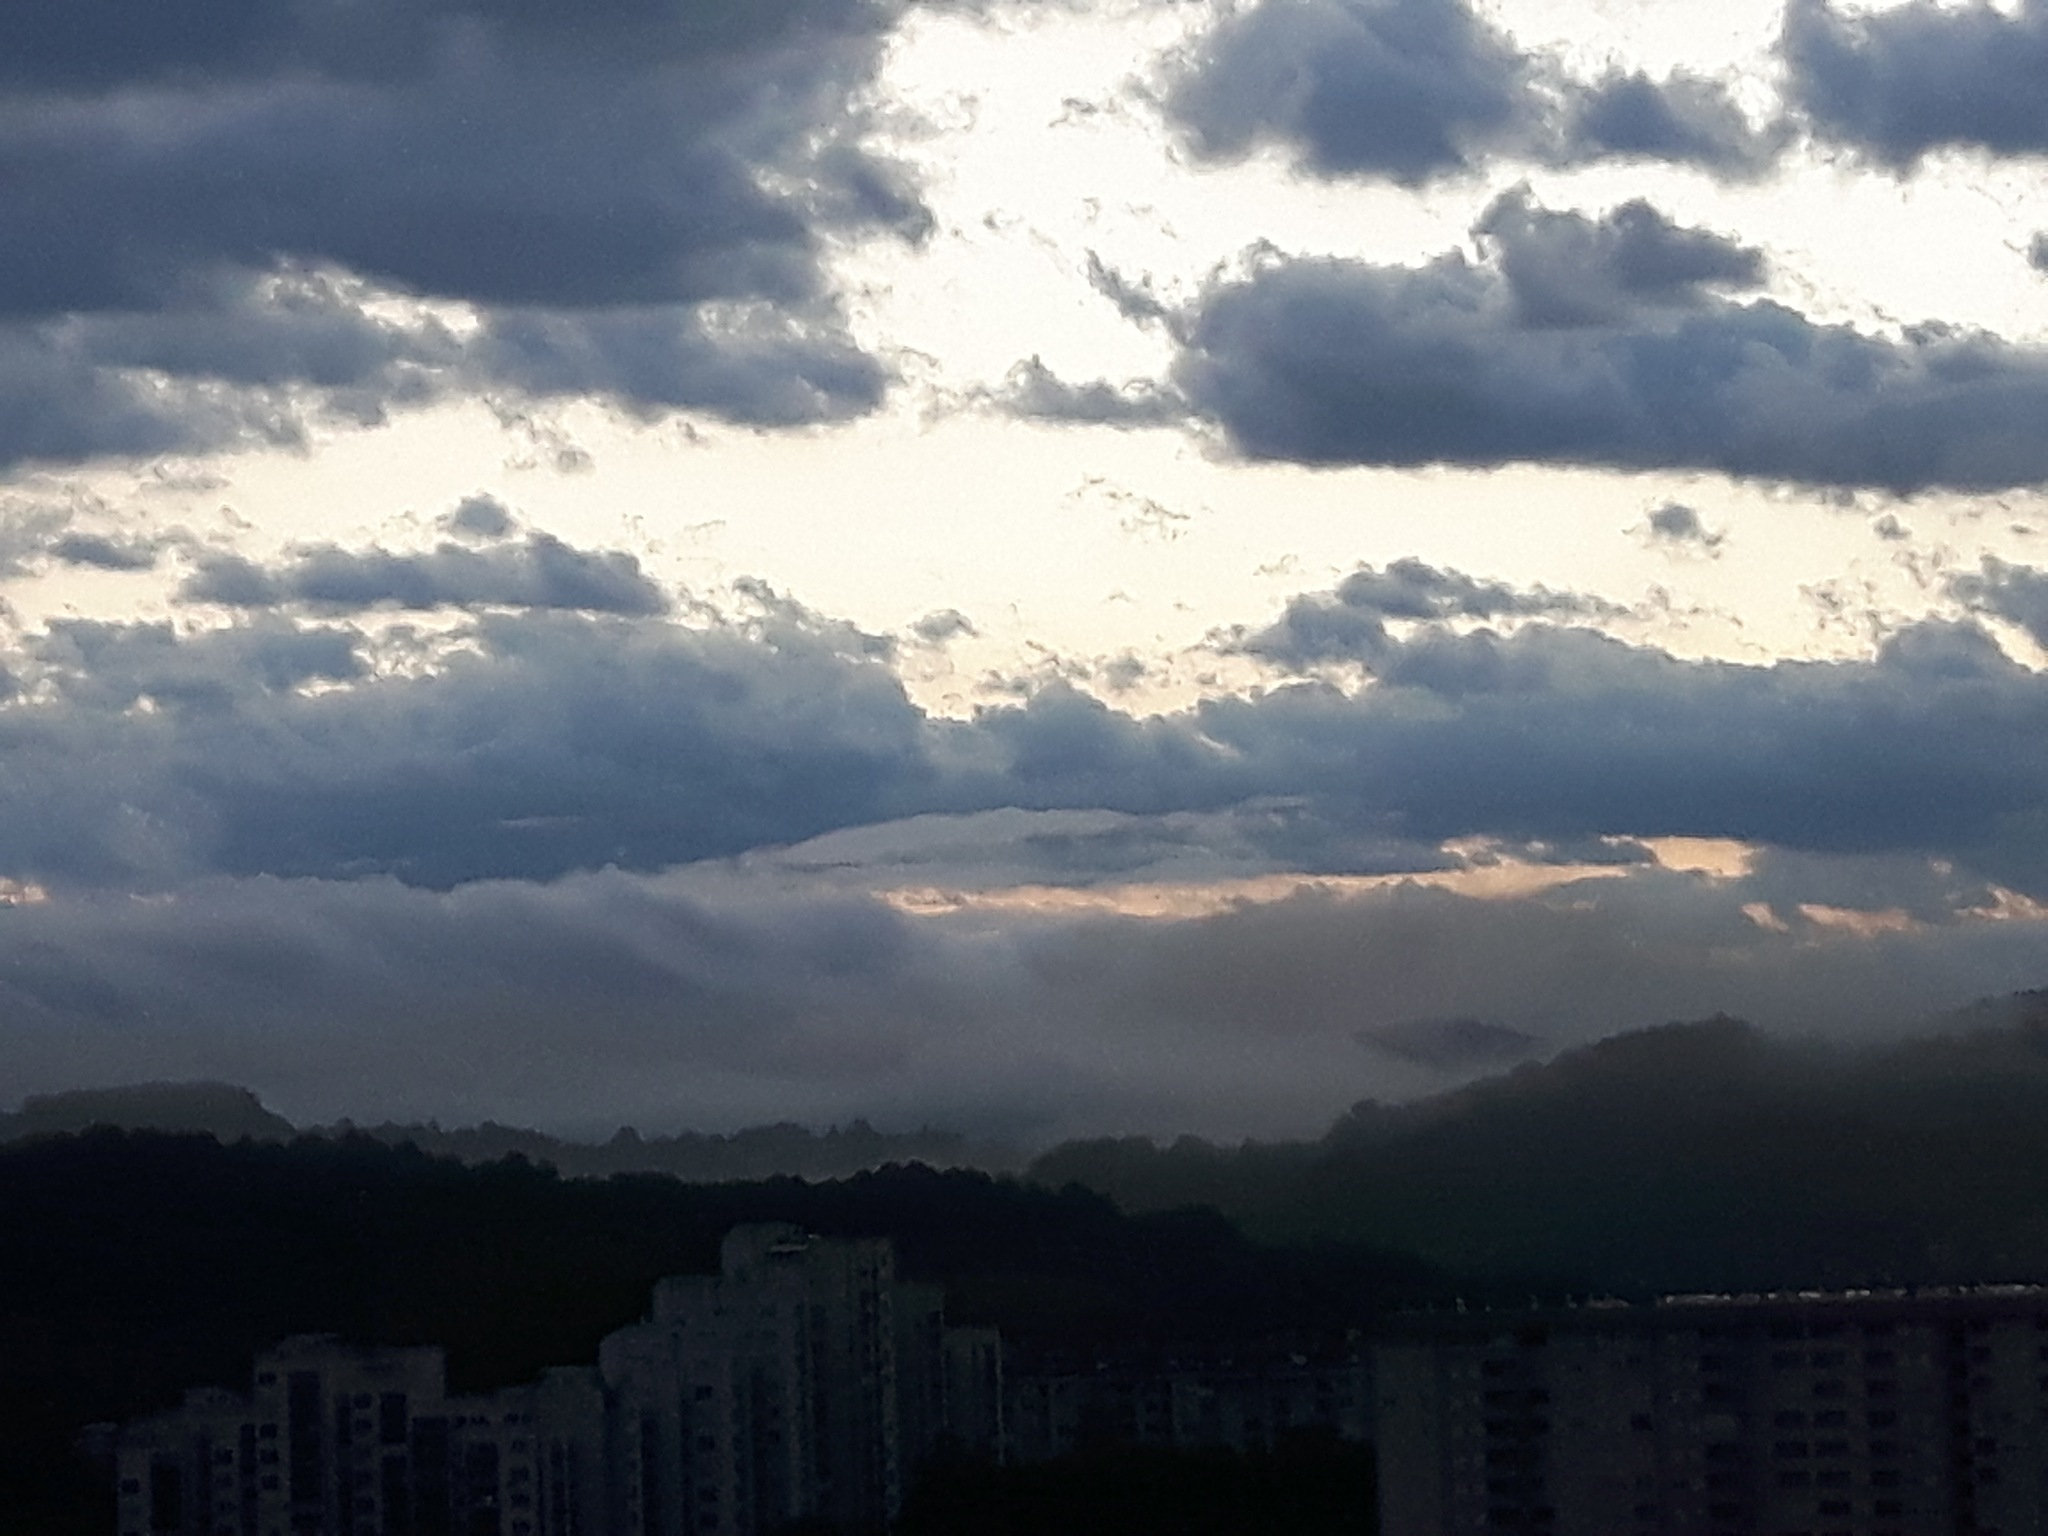 Morning sky after night raining by Mevludin_Hasanovic